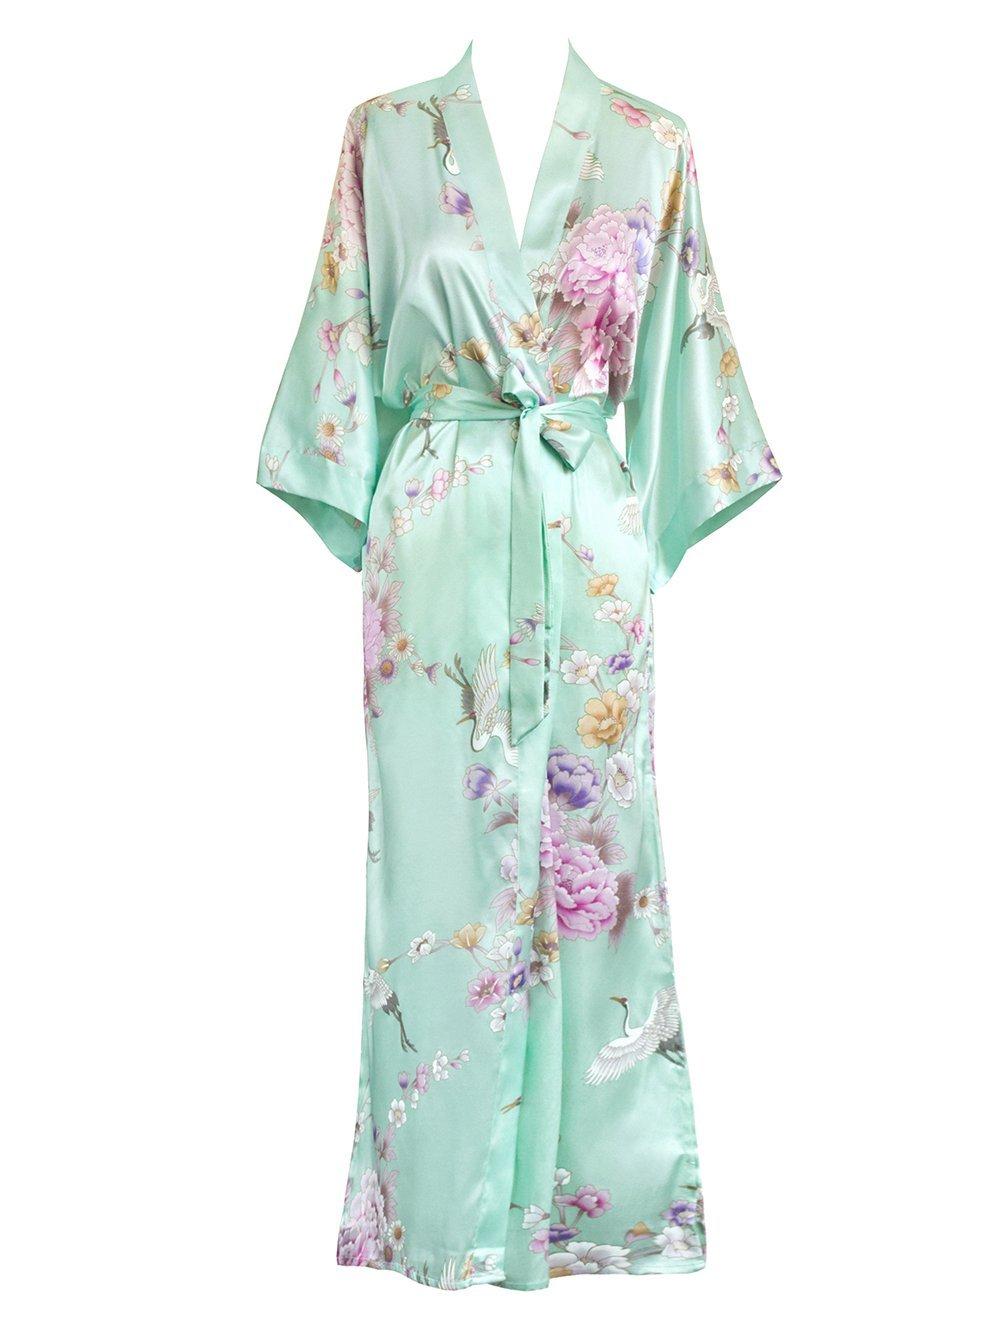 Old Shanghai Women's Kimono Long Robe - Chrysanthemum & Crane (Aqua) One Size Fits Most